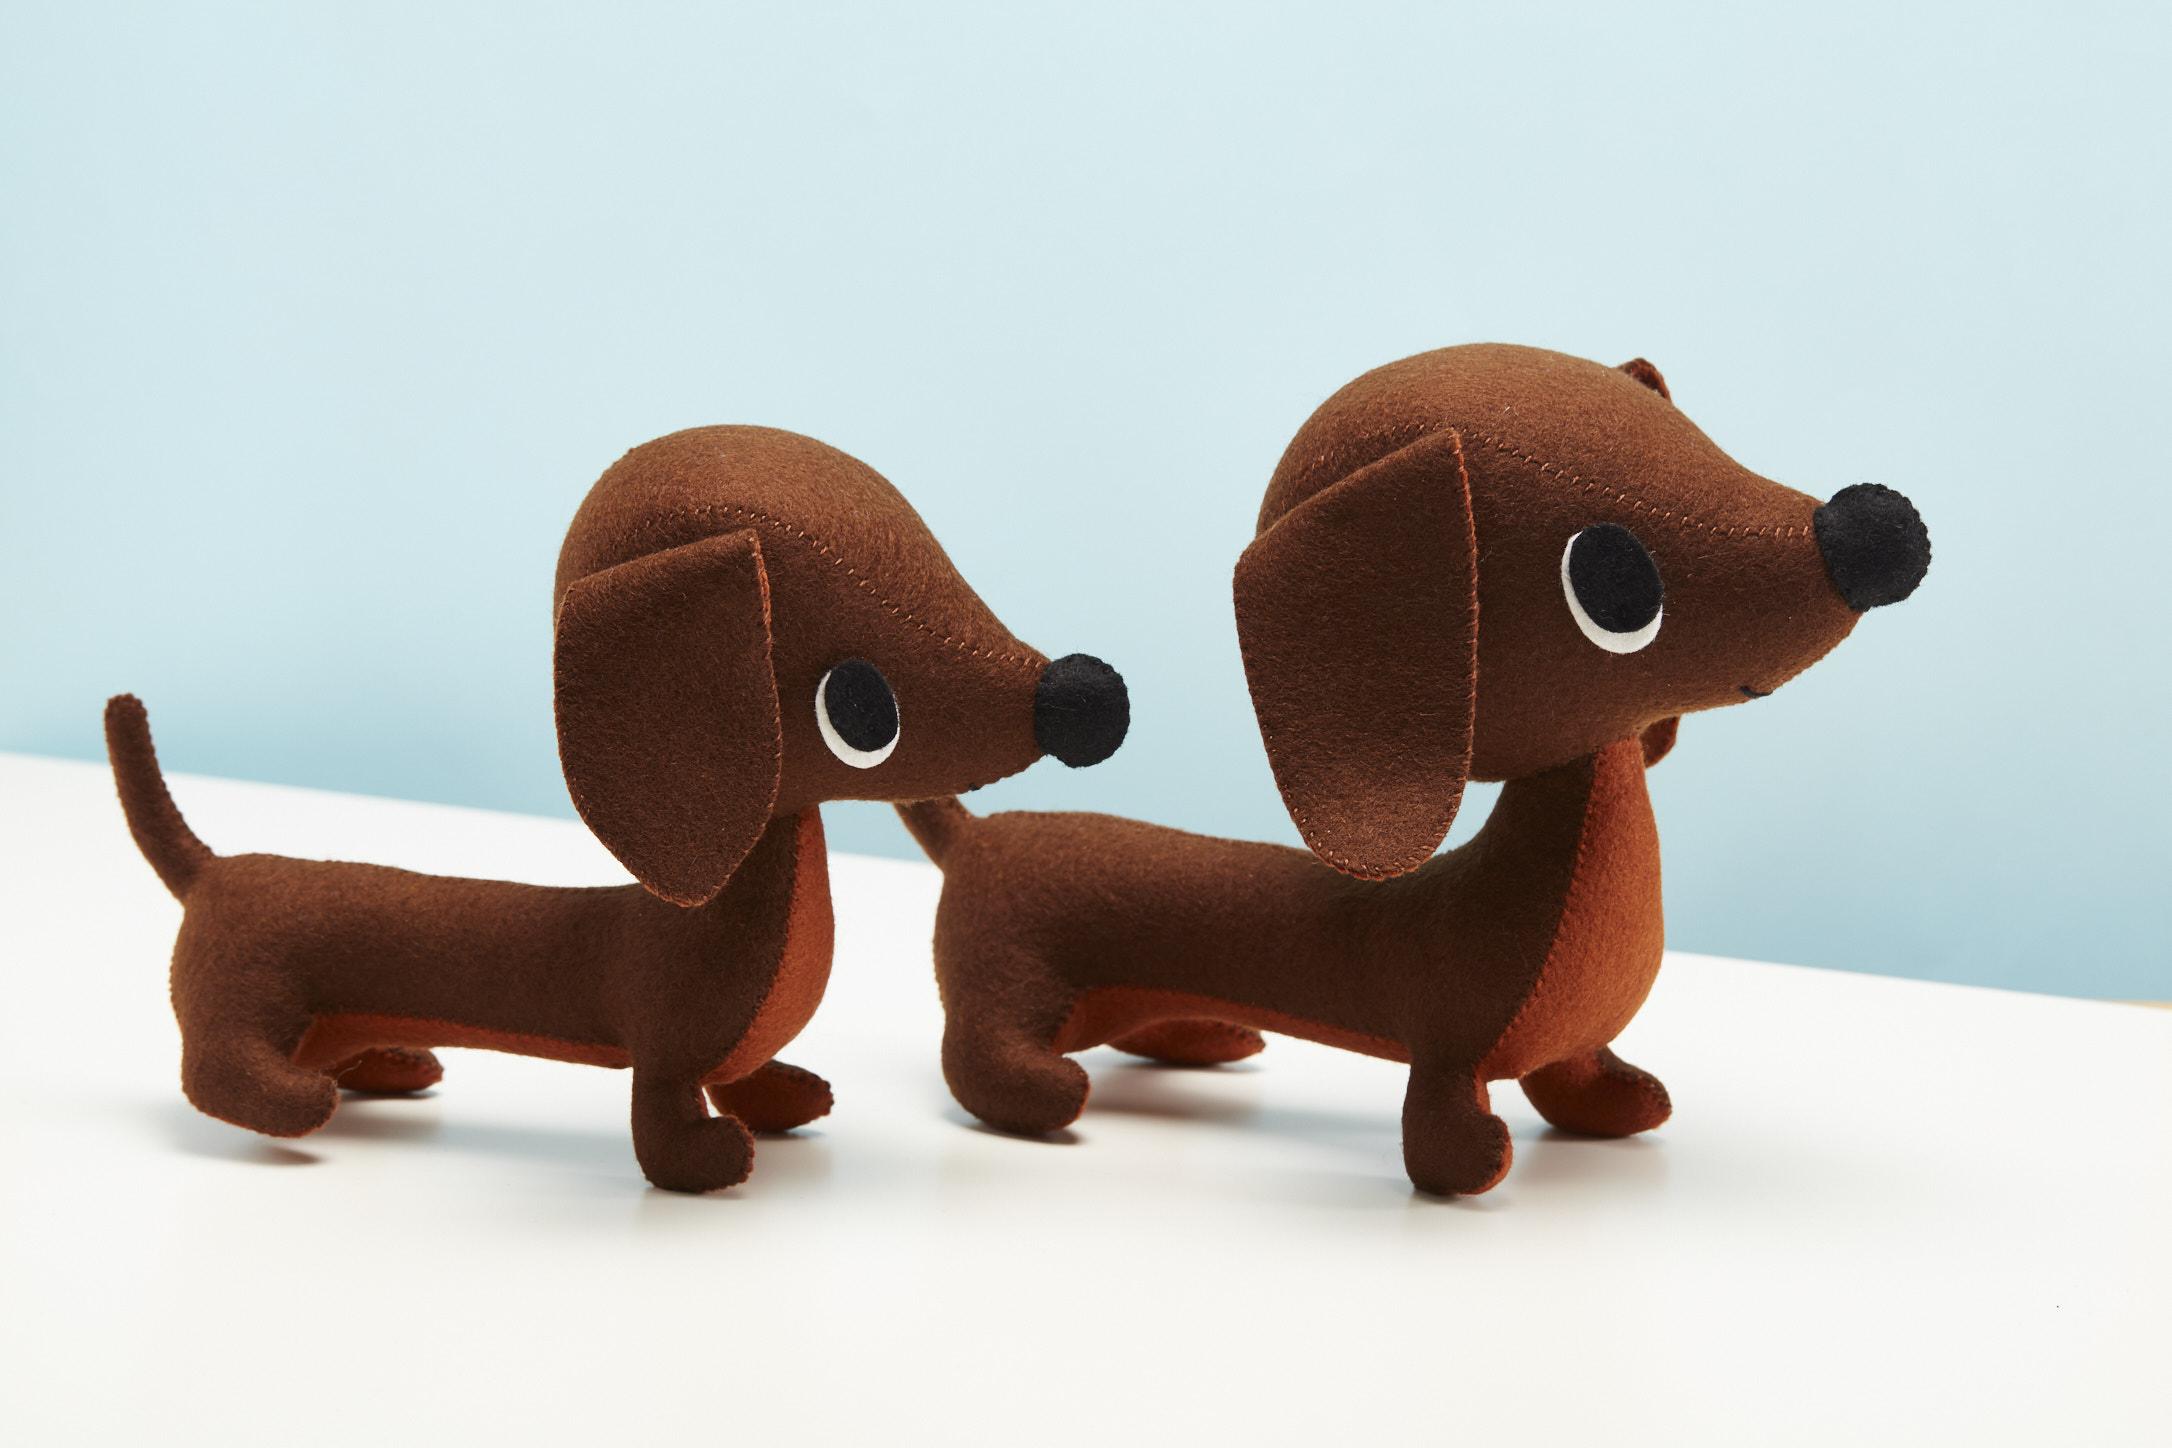 dachshunds - Felt animal Stitch Studio